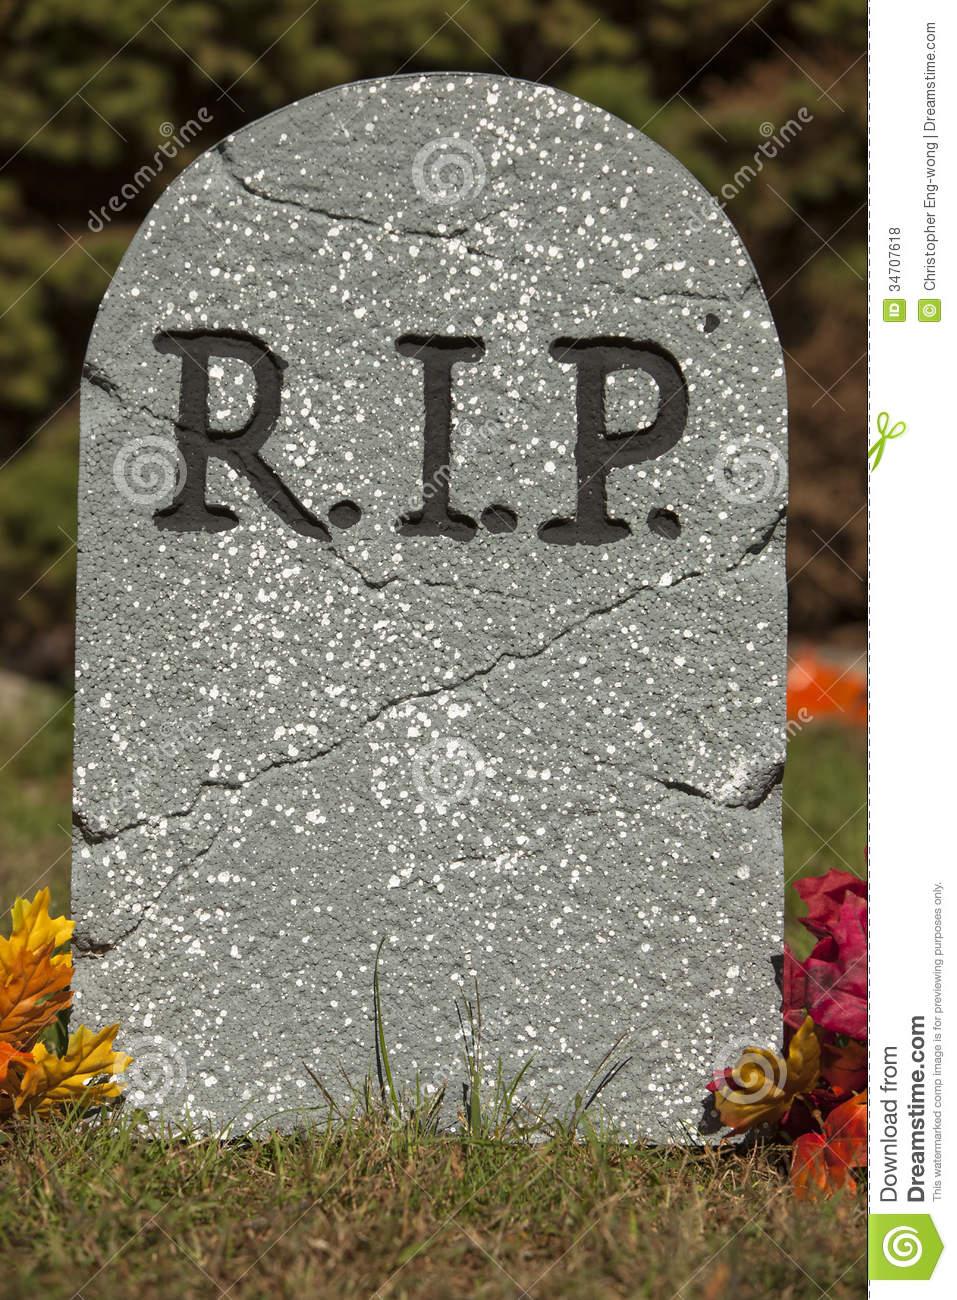 Best Image - R-i-p-grave-stone-halloween-decoration-34707618.jpg  WQ74